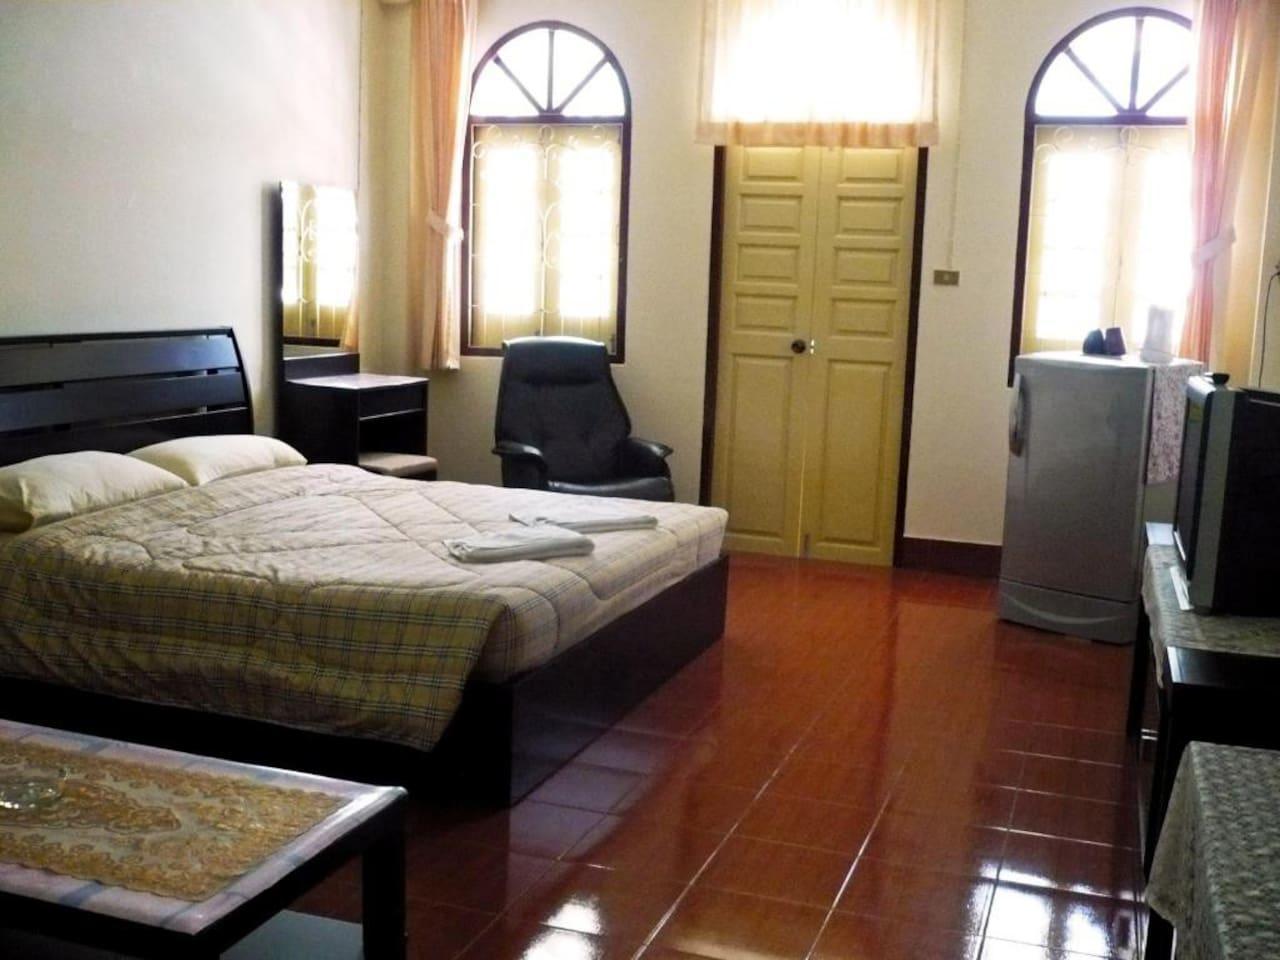 Sonya Residence 7 1 ห้องนอน 1 ห้องน้ำส่วนตัว ขนาด 30 ตร.ม. – ป่าตอง